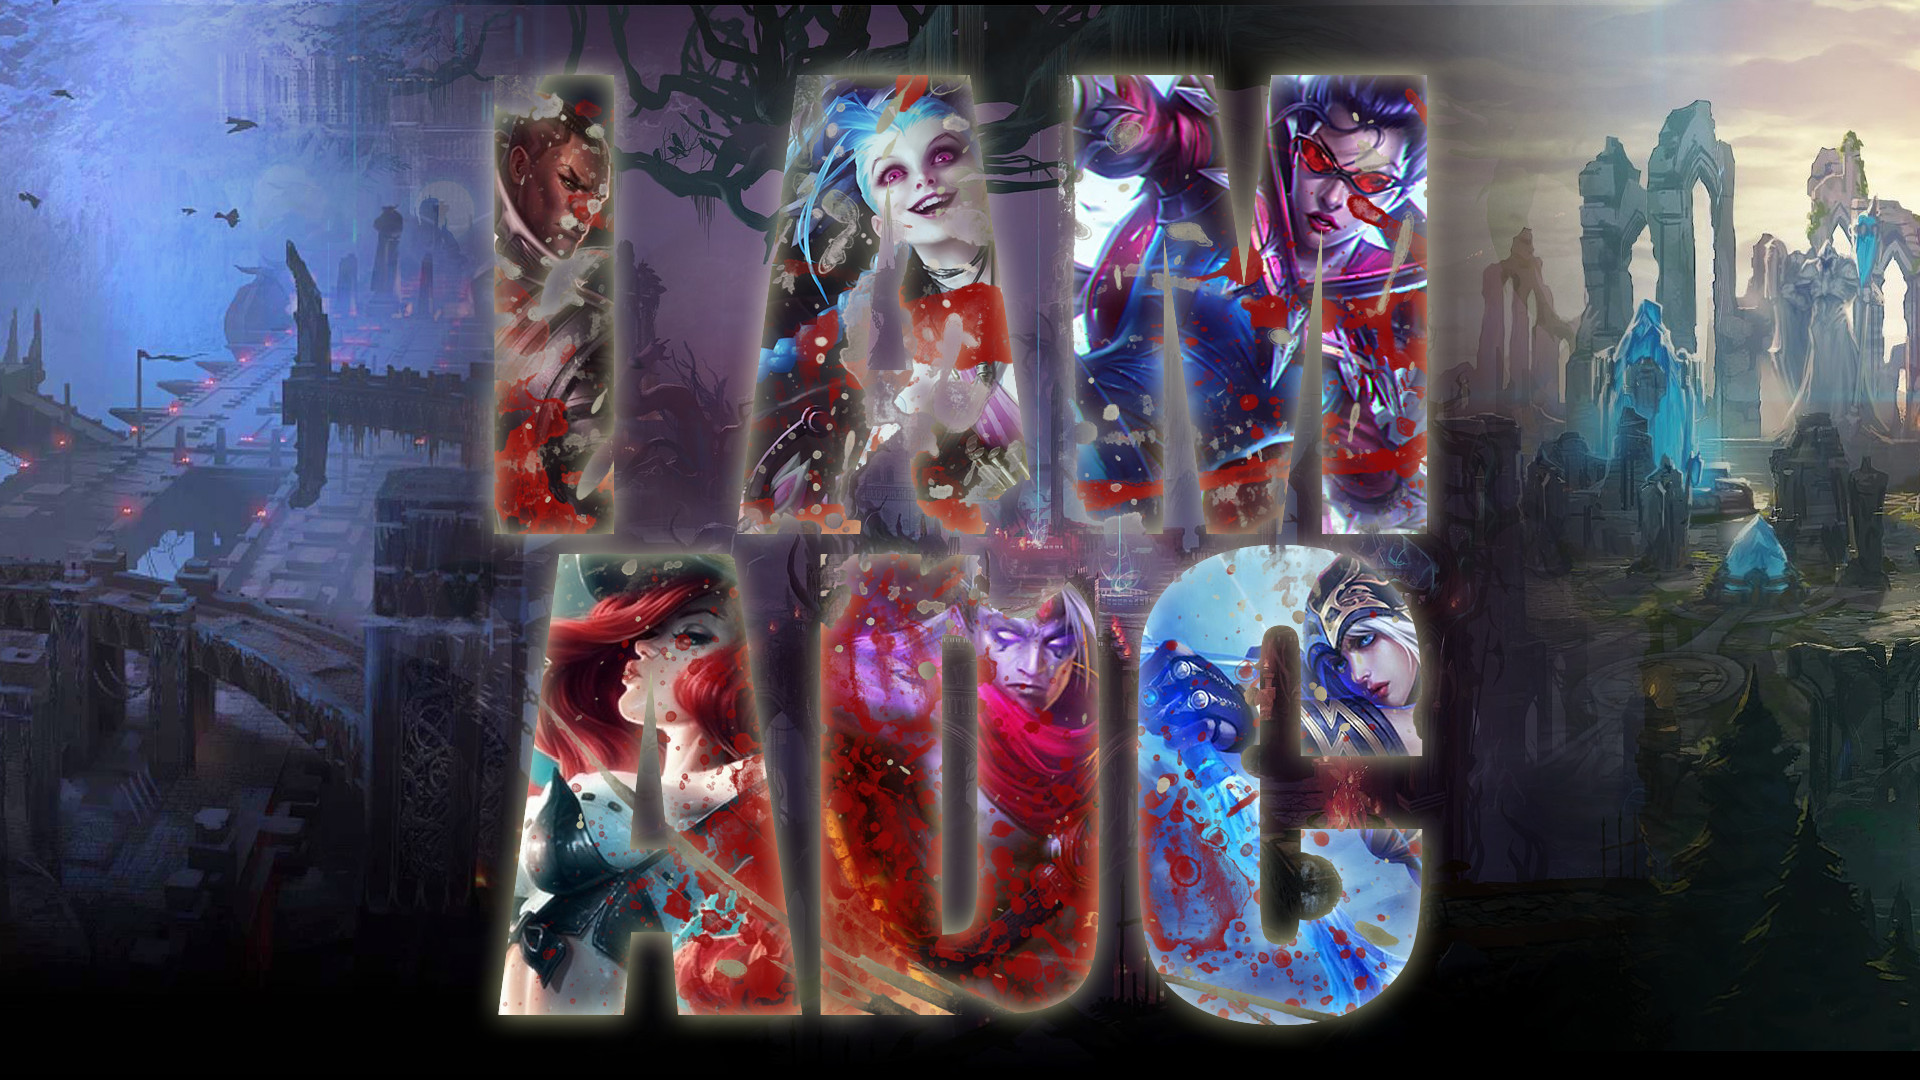 46 Vayne (League Of Legends) HD Wallpapers | Backgrounds – Wallpaper Abyss